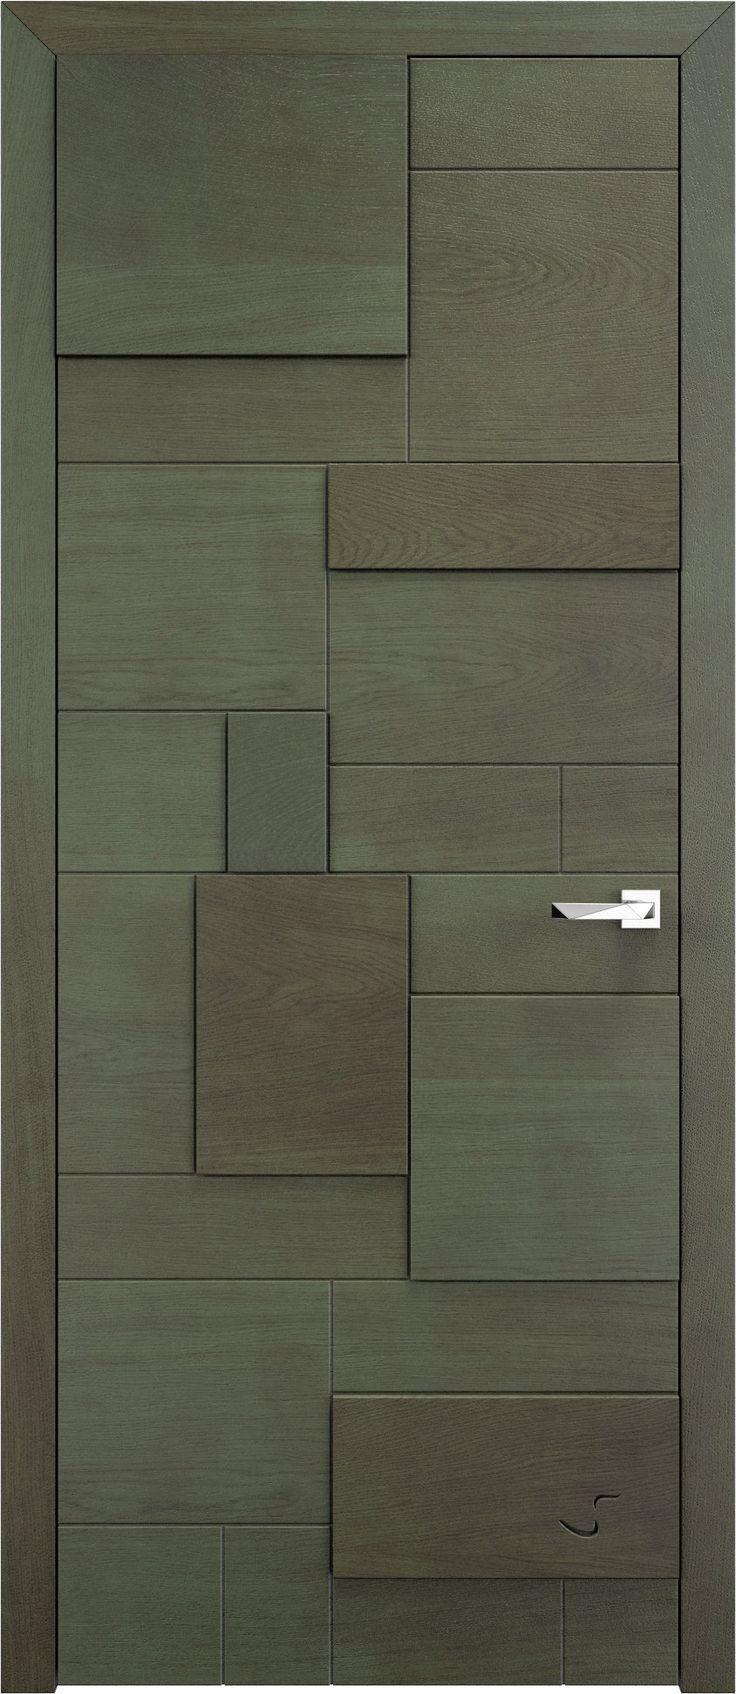 Dorian. interior design. door design. #dorian #interiordesign #doordesign